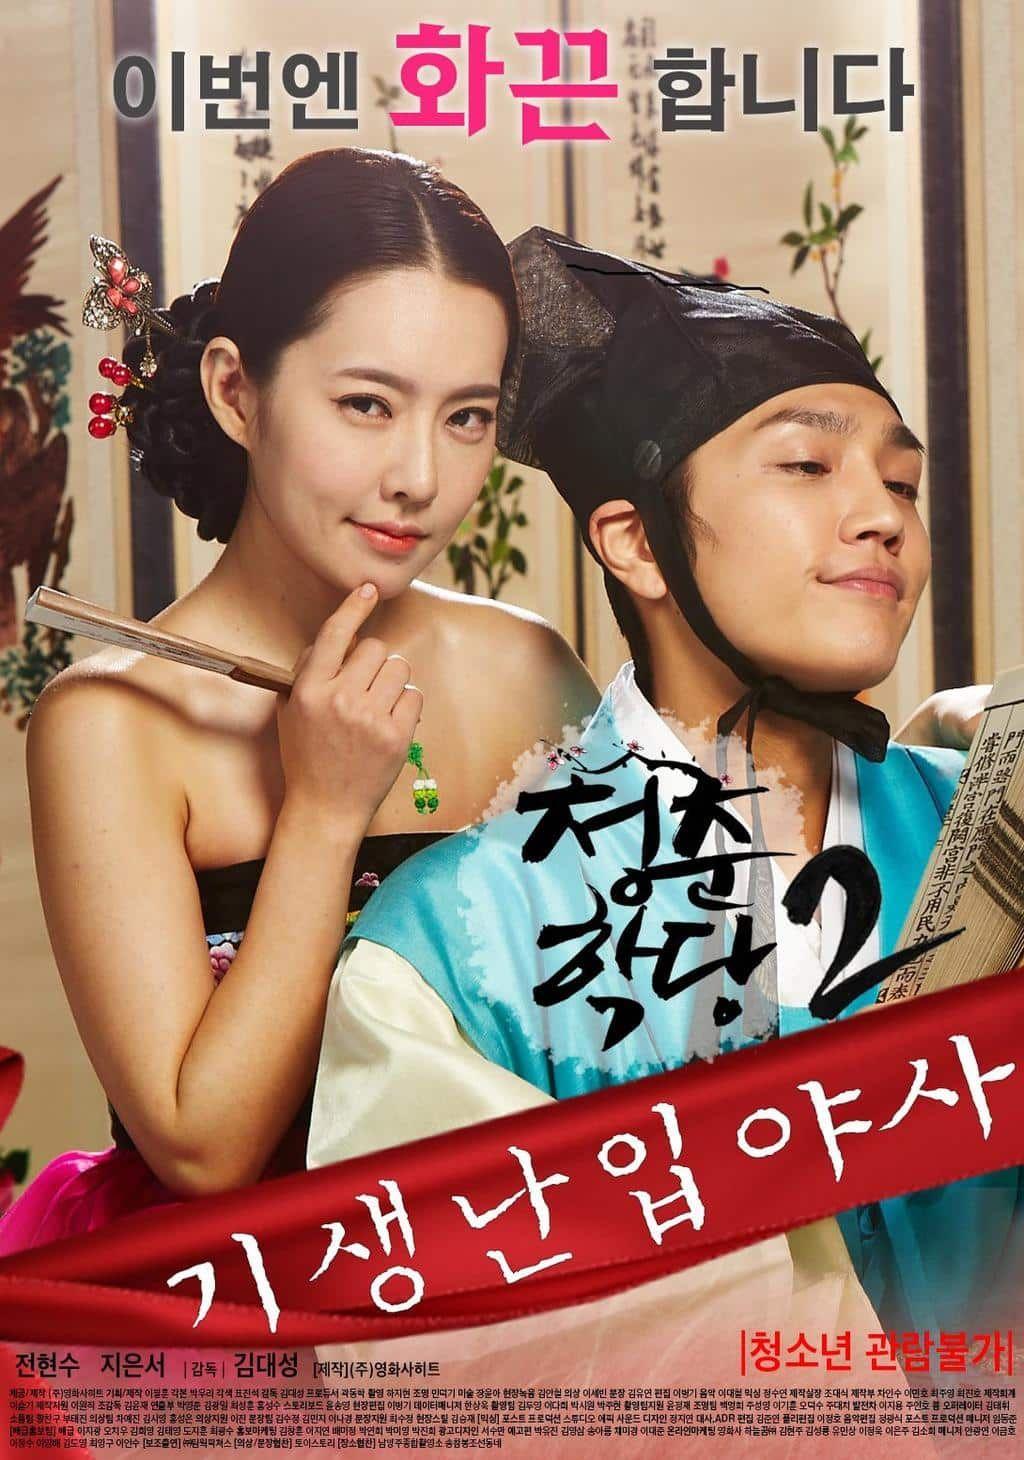 School Of Youth 2 Full Korea 18+ Adult Movie Online Free